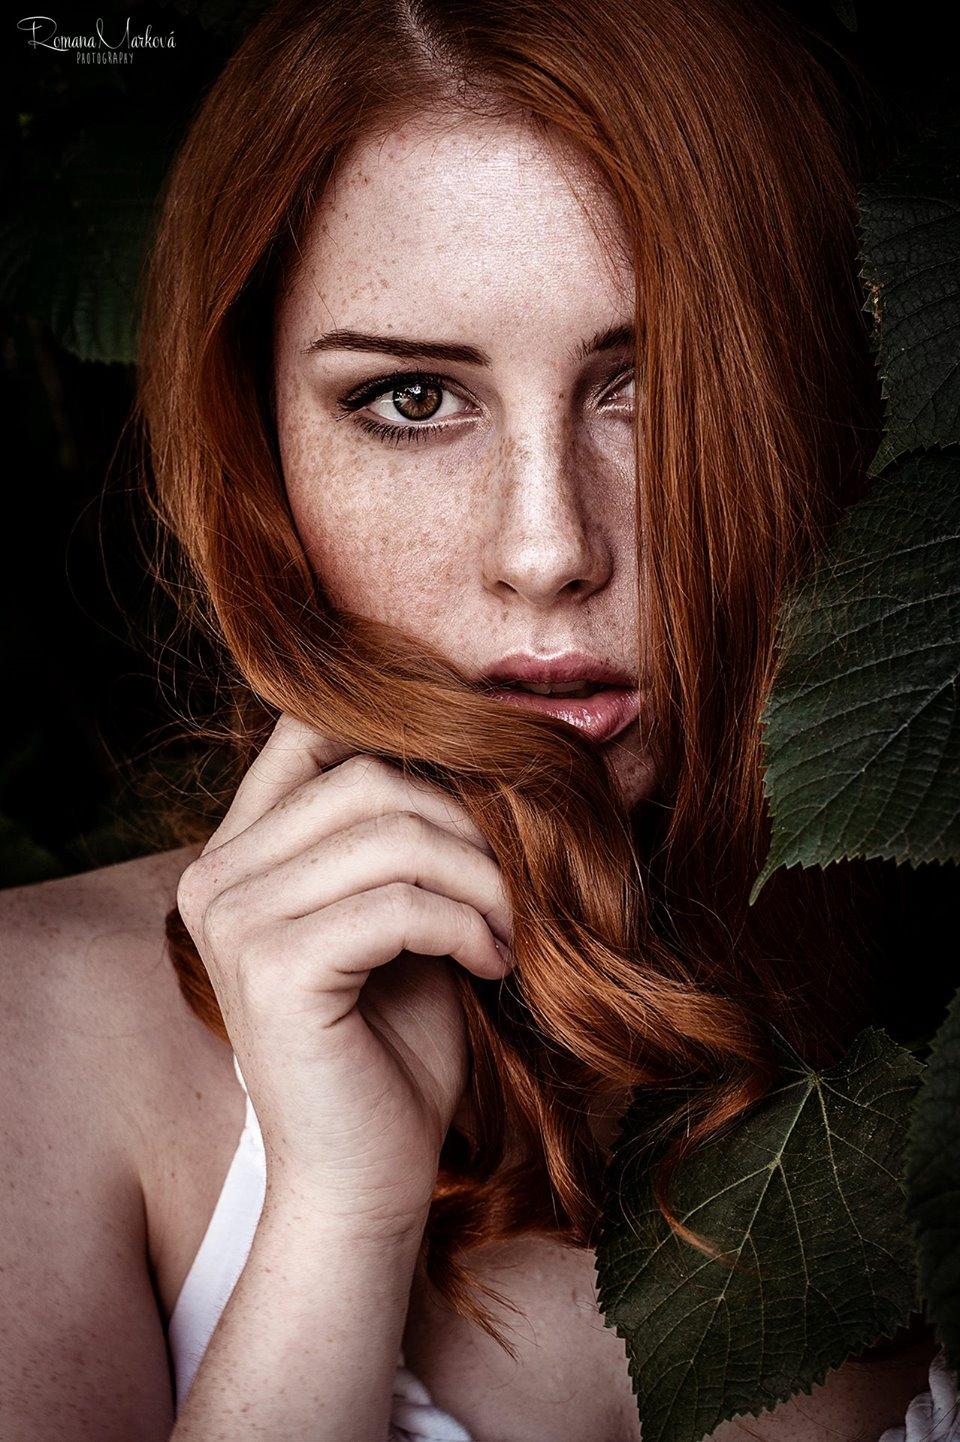 Lenka Regalová redhead freackles leaf profile